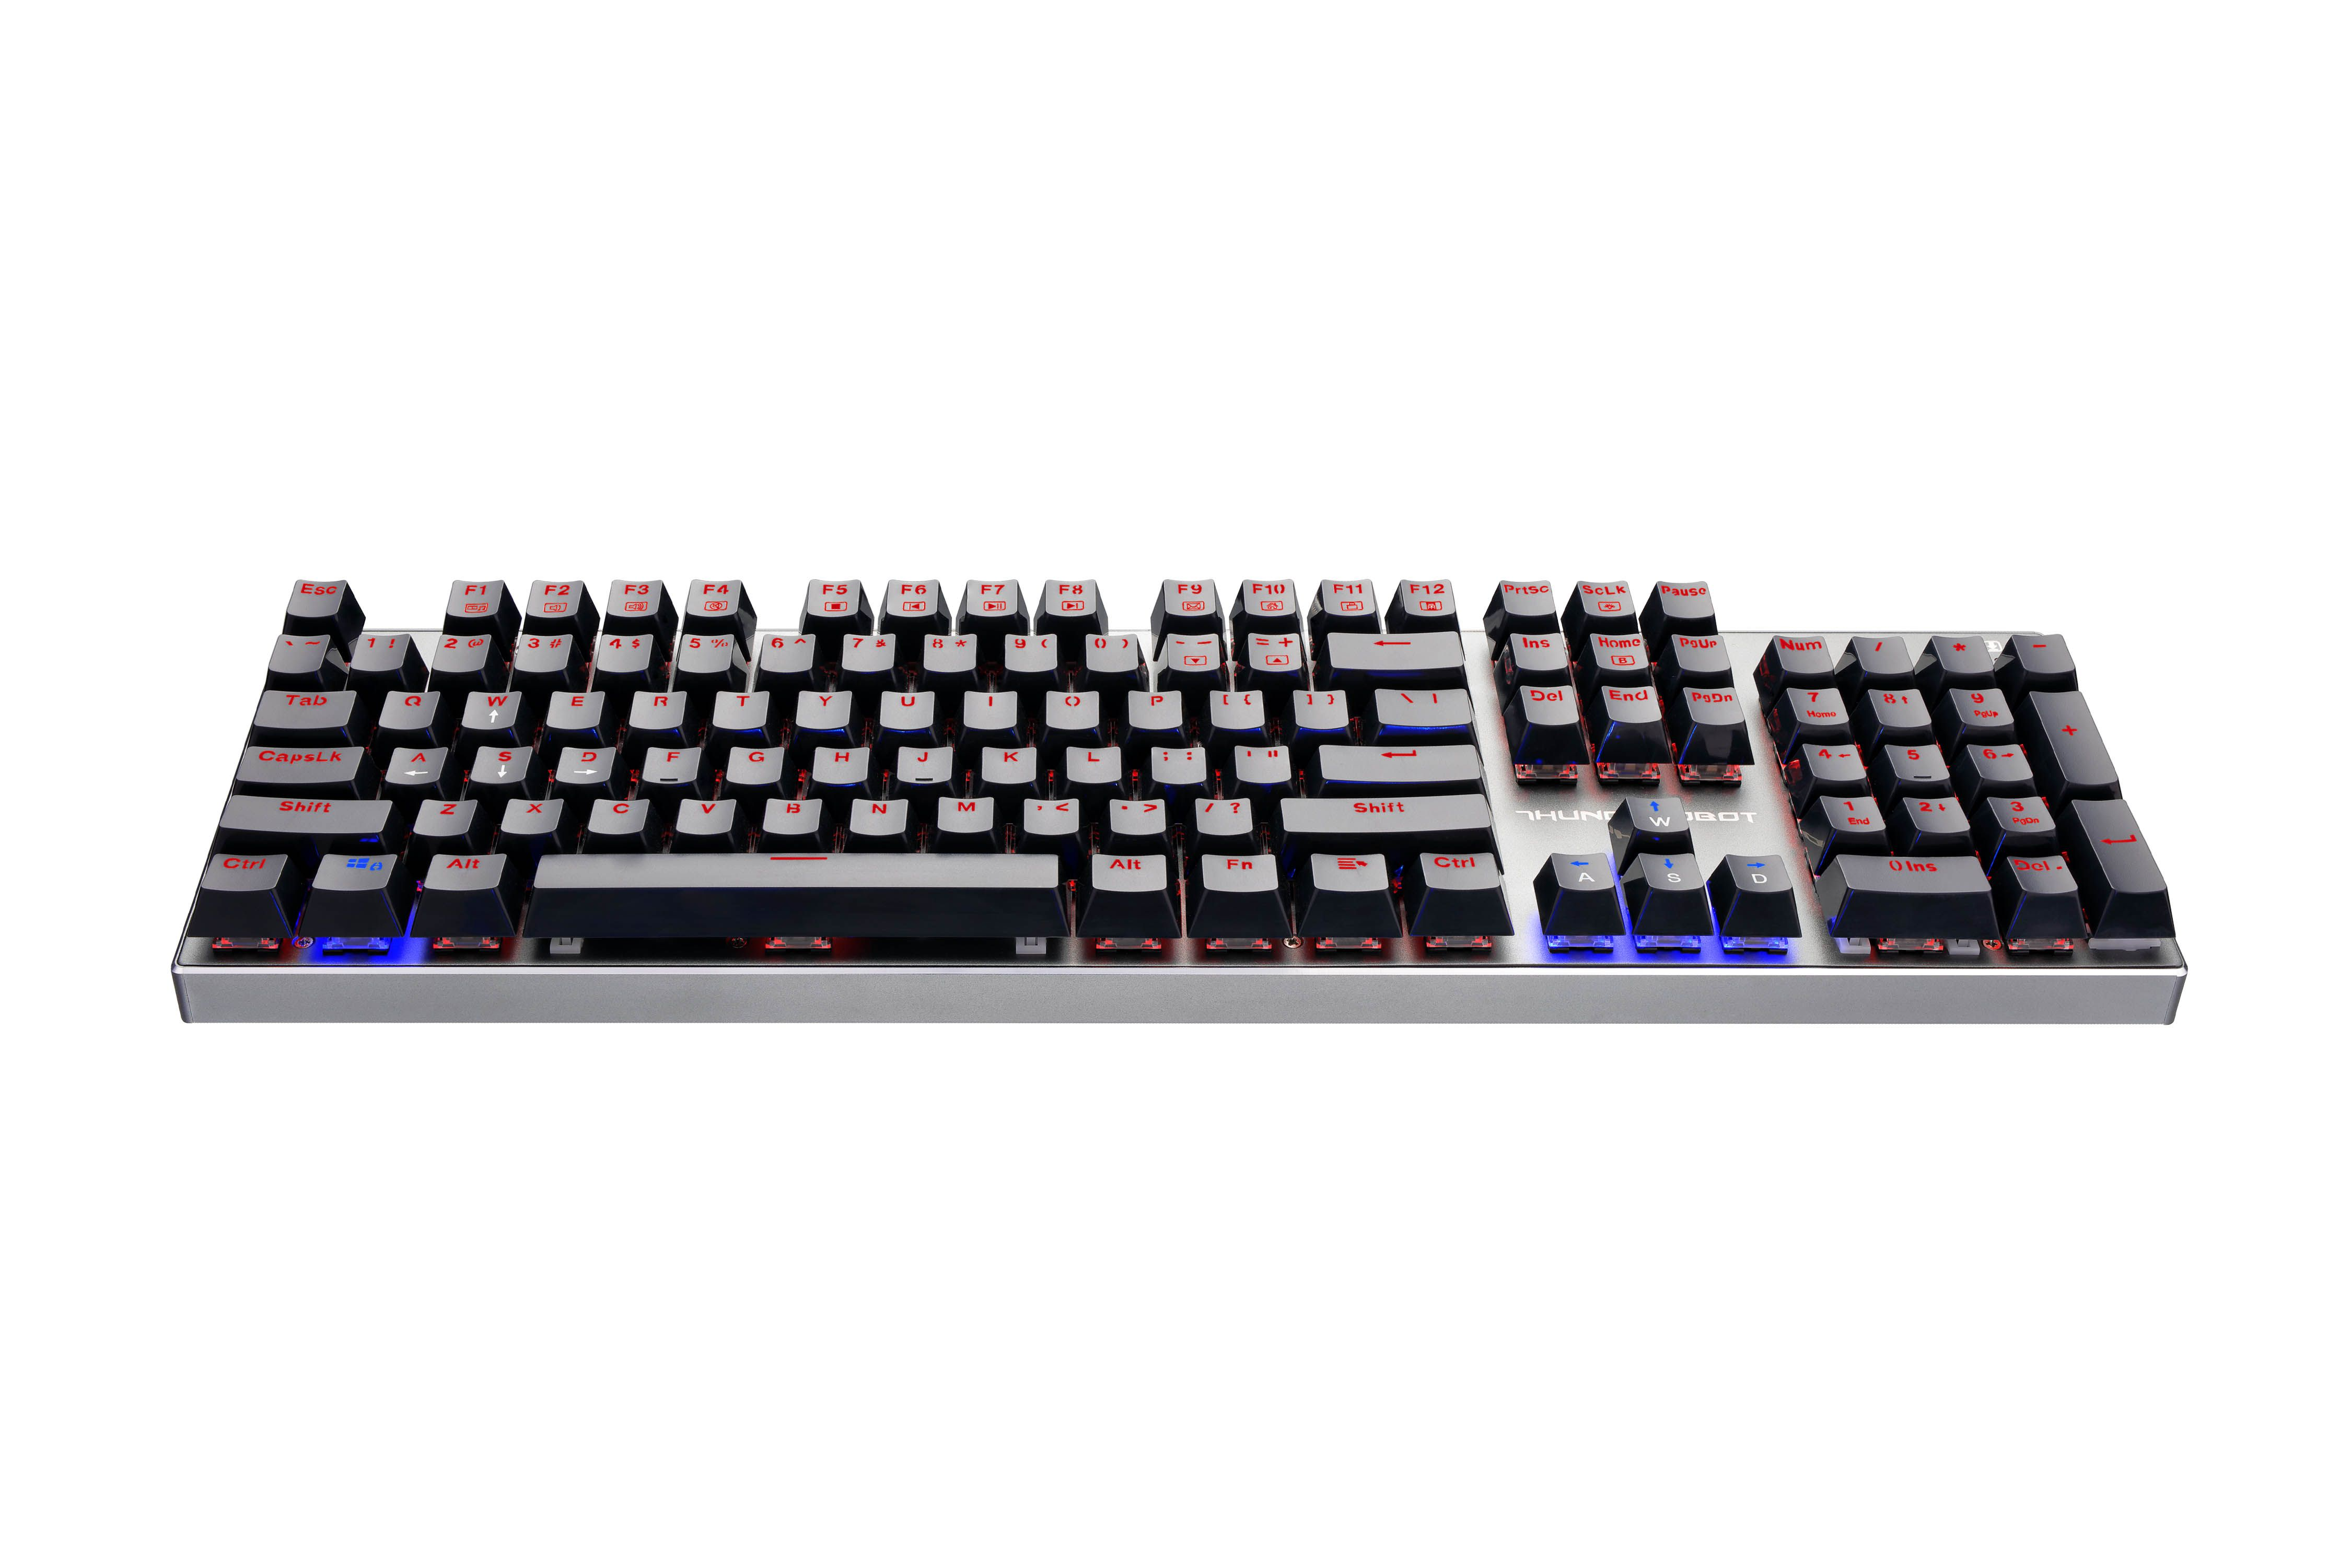 Los punteros teclados de gaming de Thunderobot desembarcan en Europa